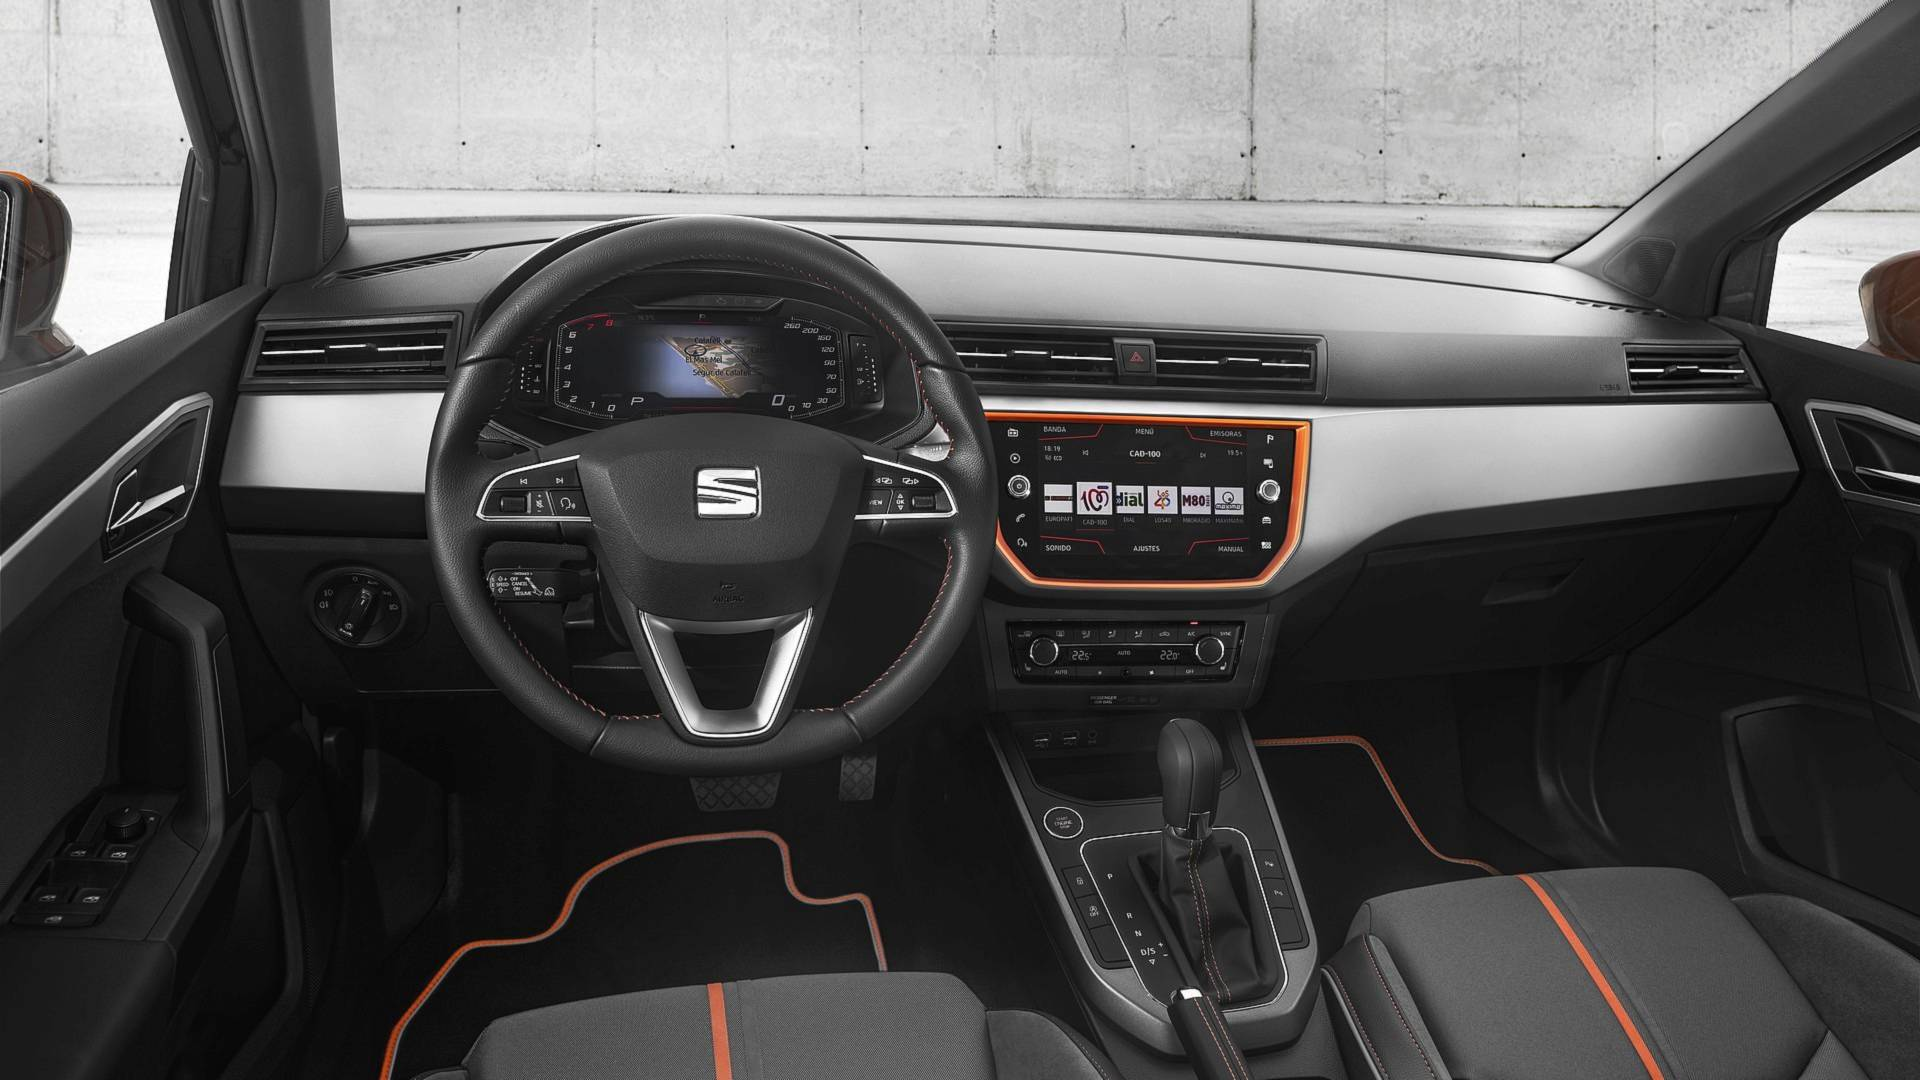 Cupra Arona Coming in 2020 With 200 HP 2-Liter Turbo - autoevolution